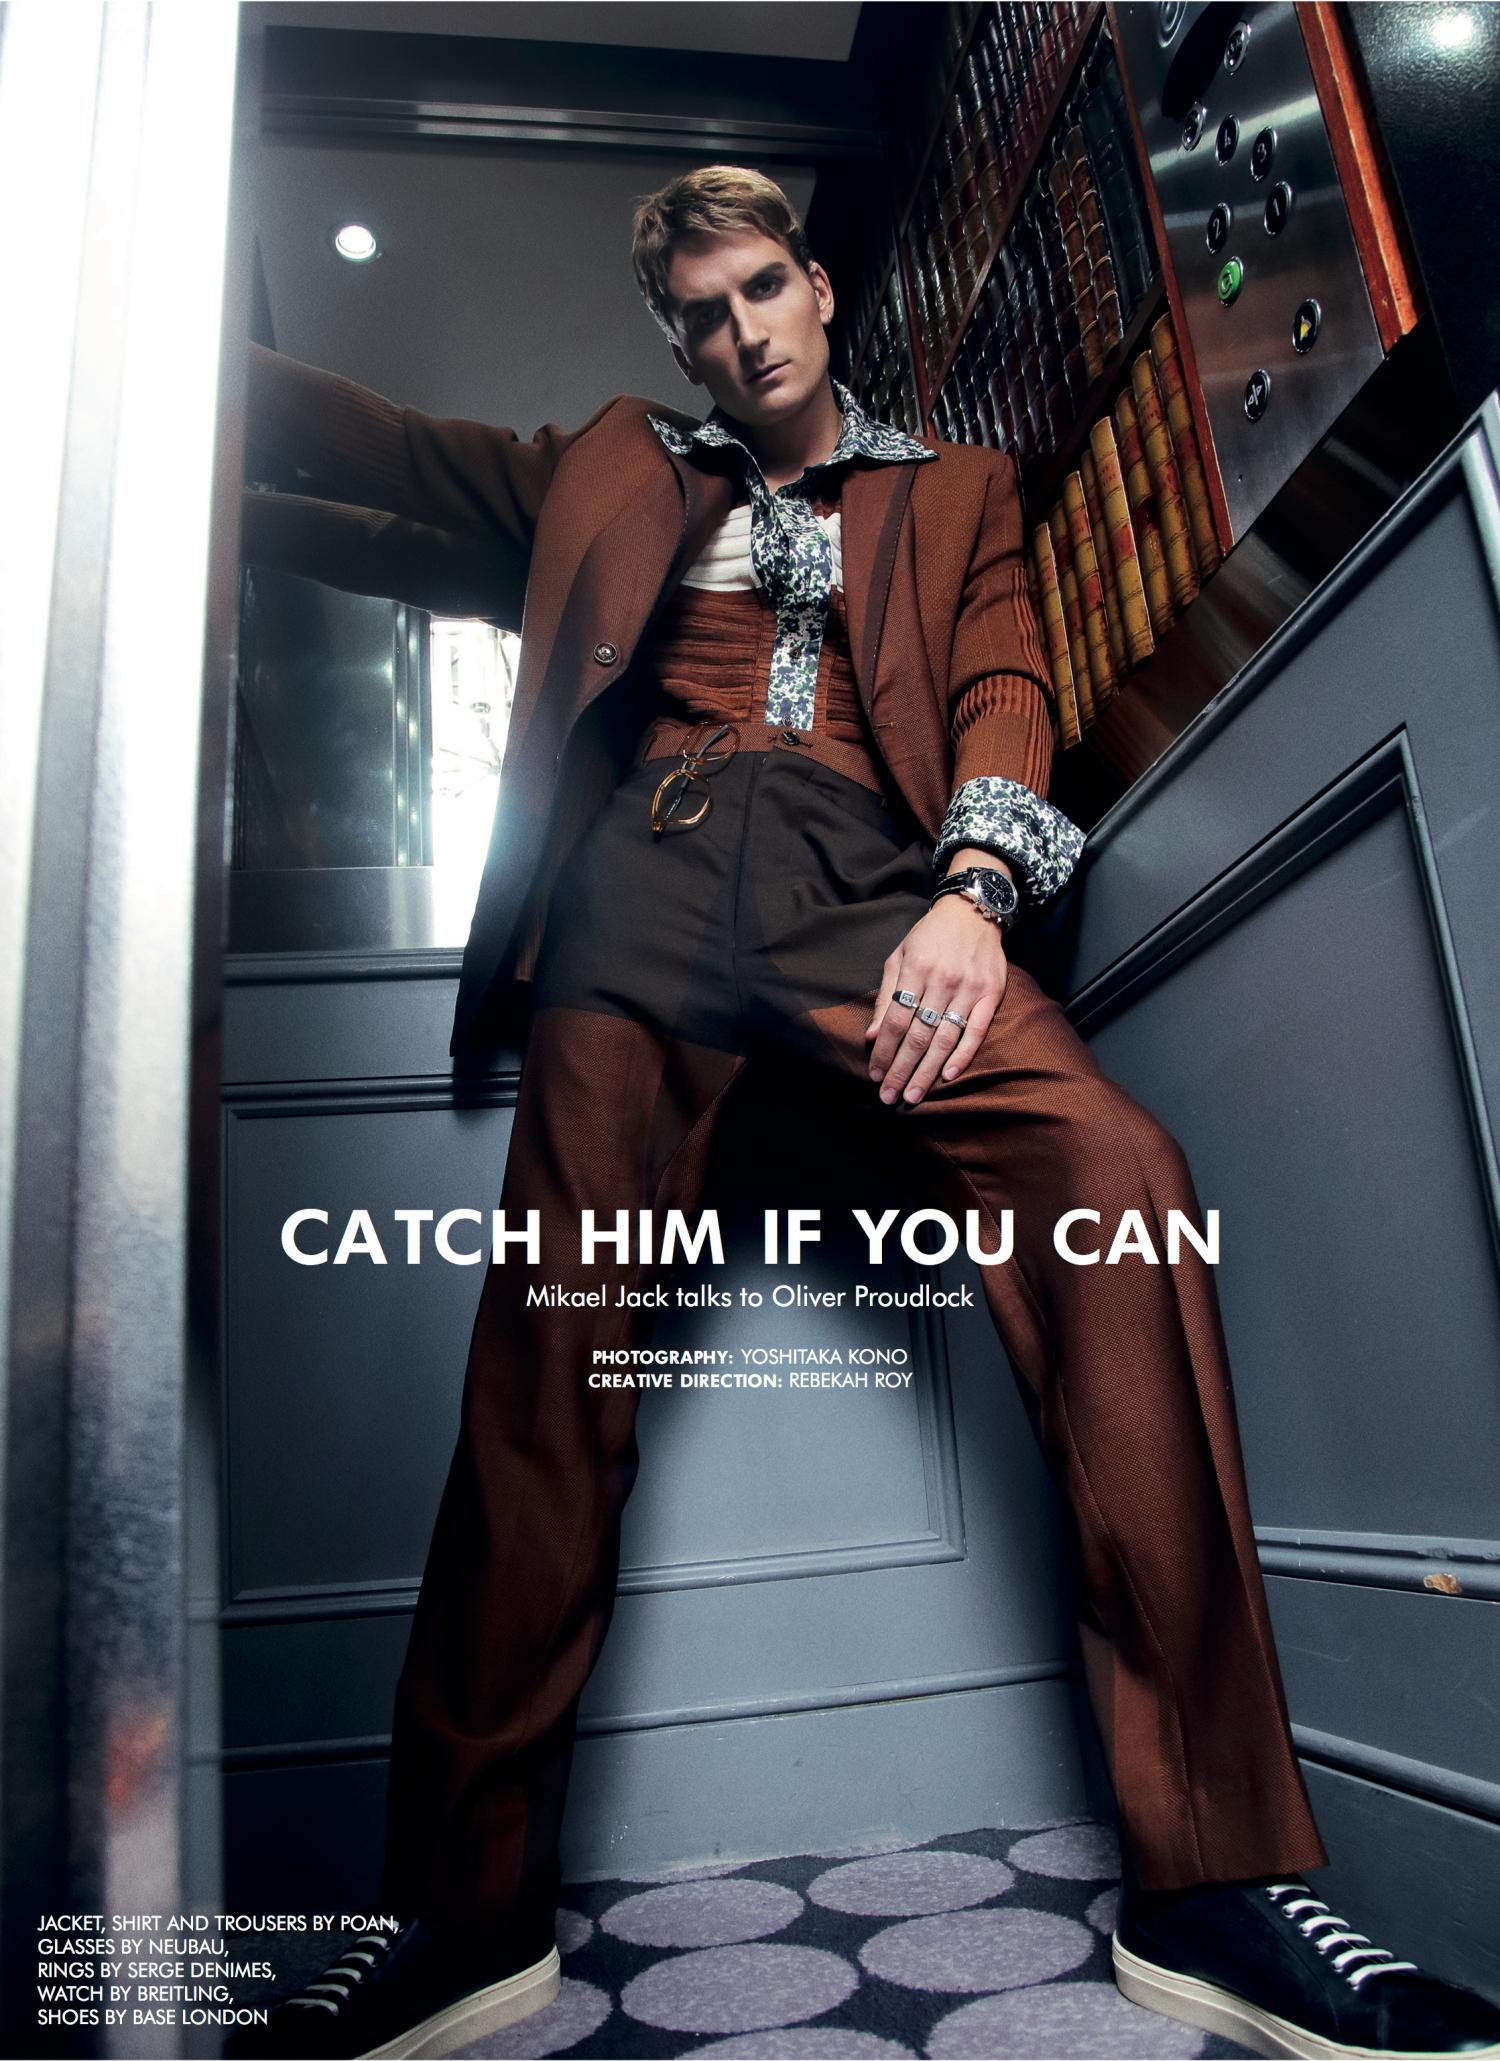 Oliver Proudlock for Candid Magazine